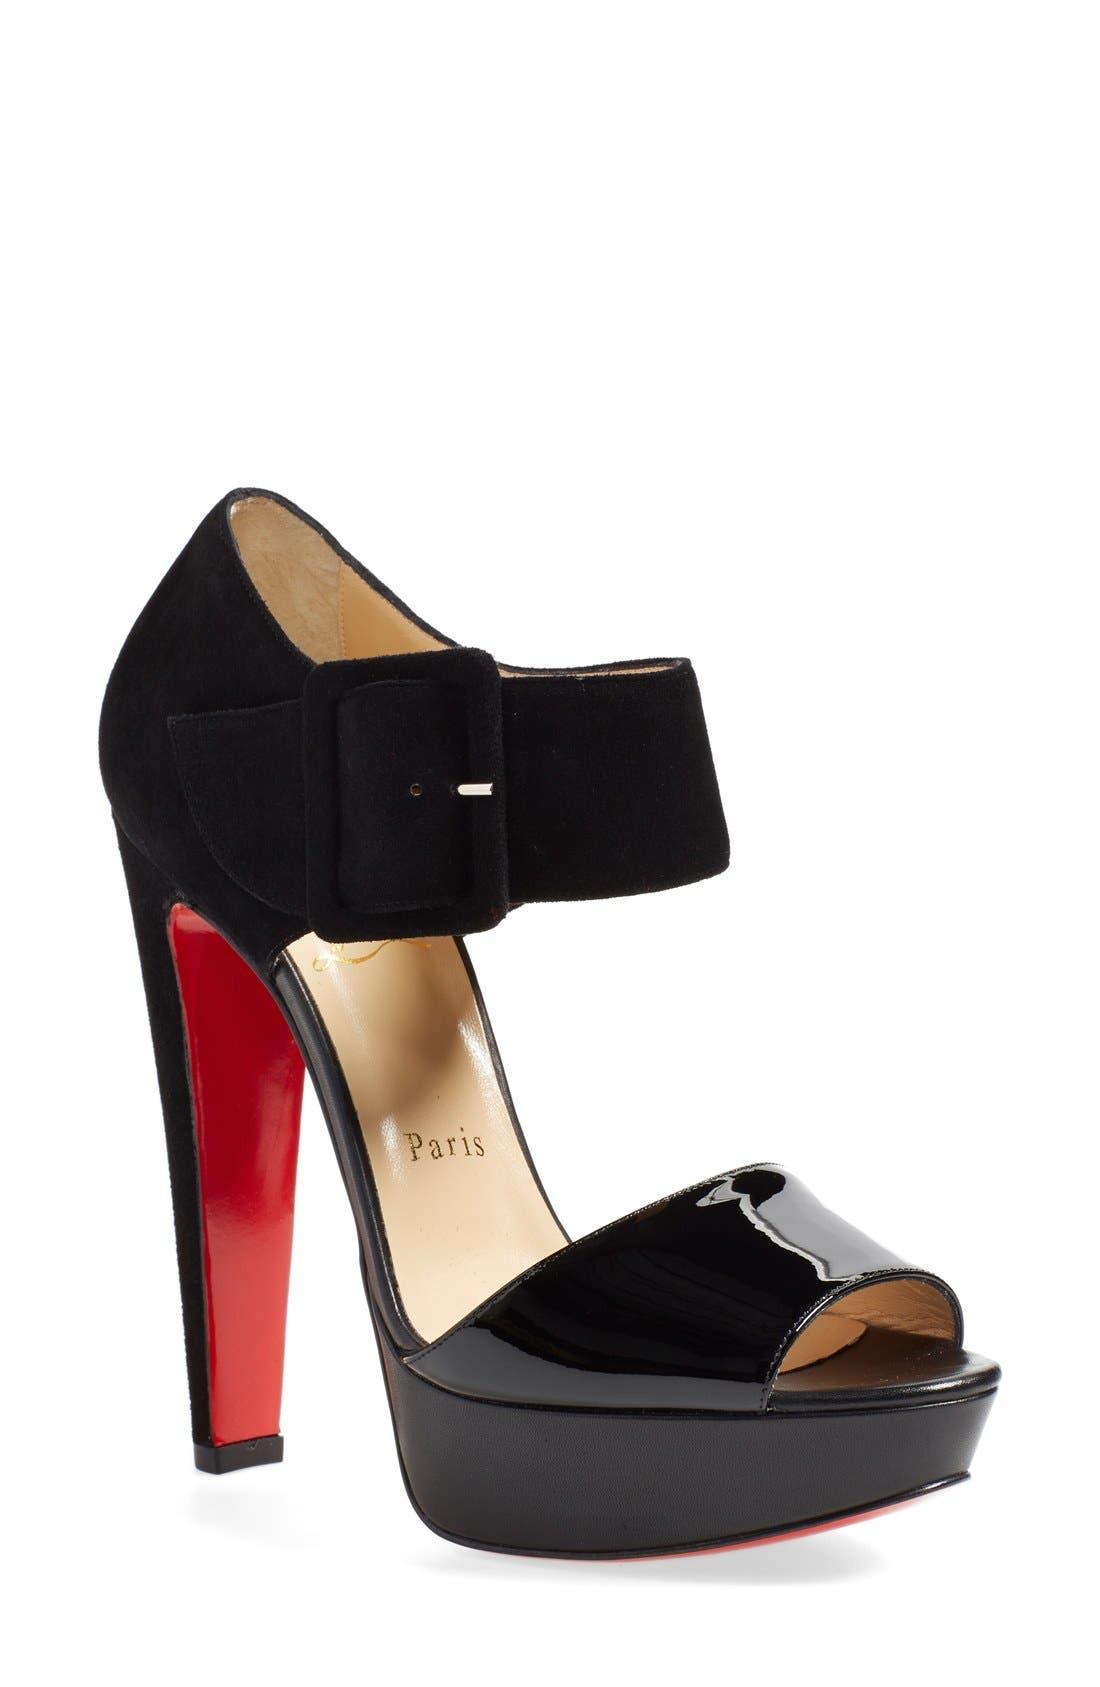 Alternate Image 1 Selected - Christian Louboutin 'Haute Retenue' Platform Sandal